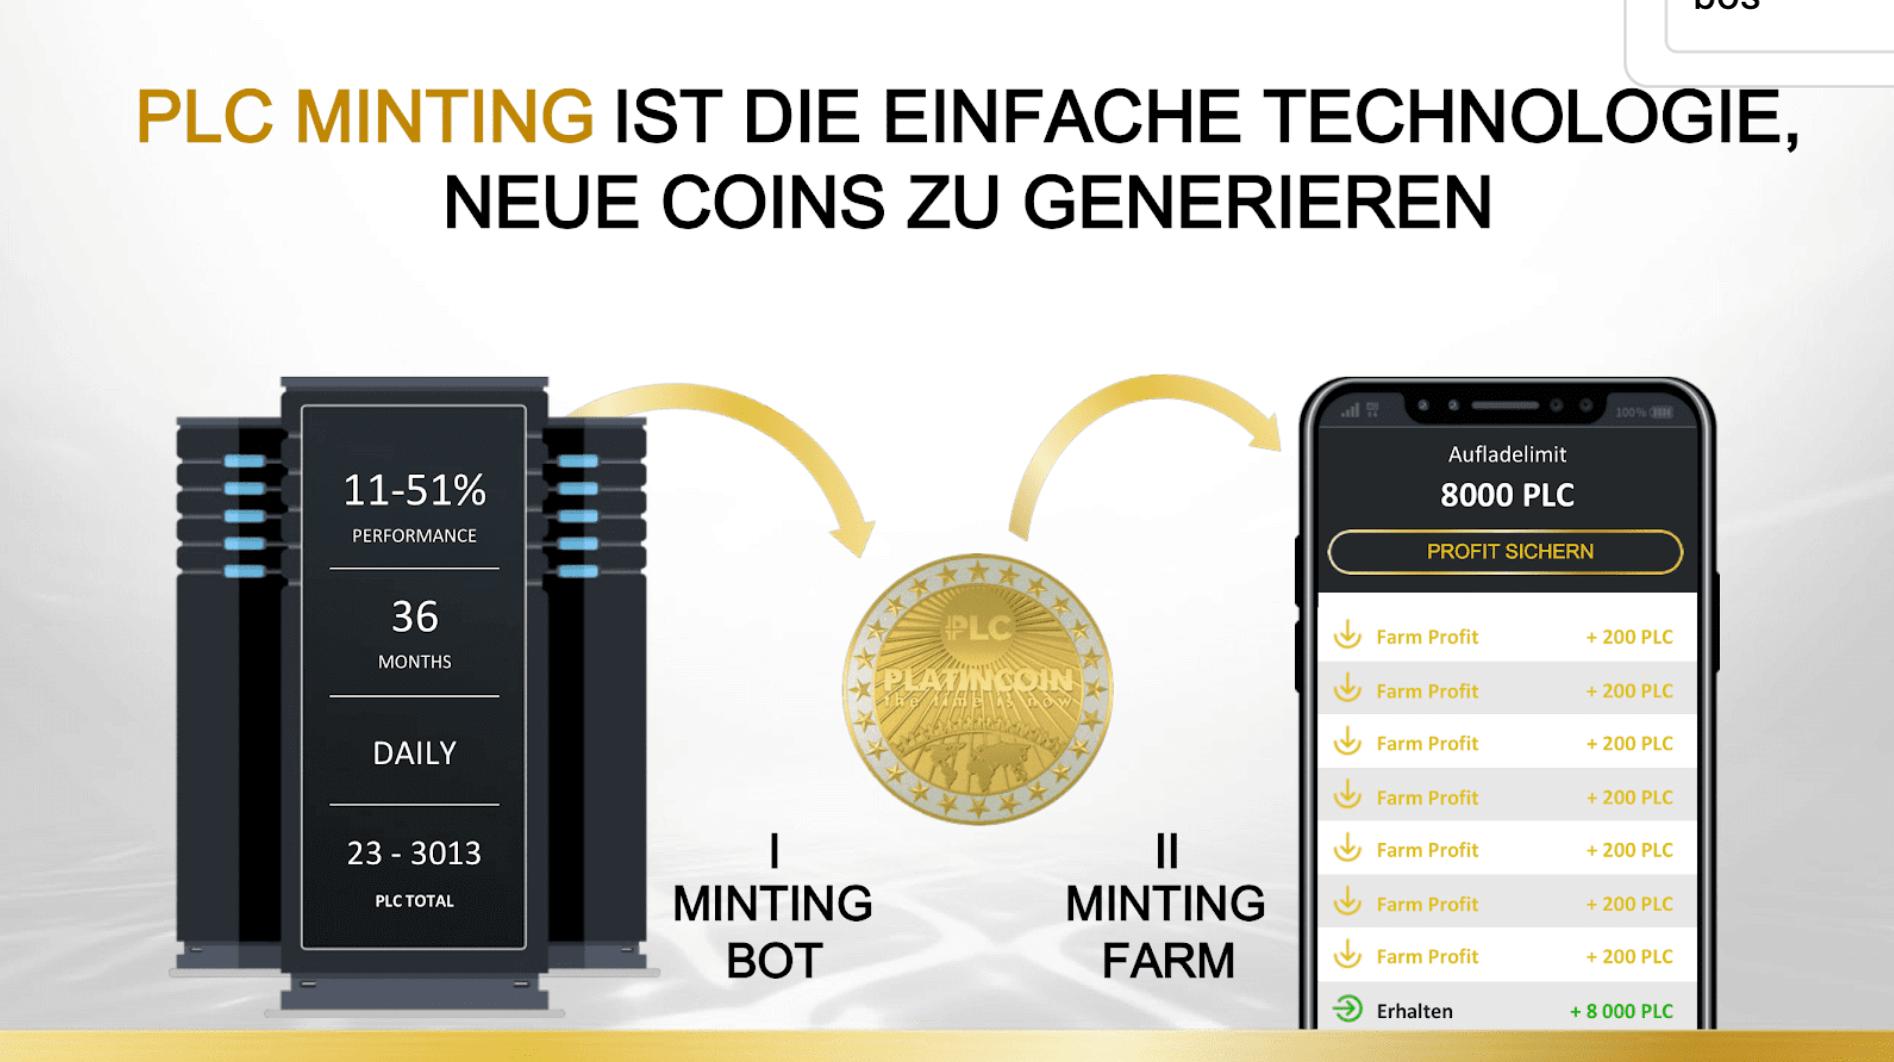 platincoin wert euro, platincoin mining, platincoin pakete, platincoin exchange, platincoin schneeball, platincoin bewertung, platincoin team, platincoin smart contract, platincoin dashboard